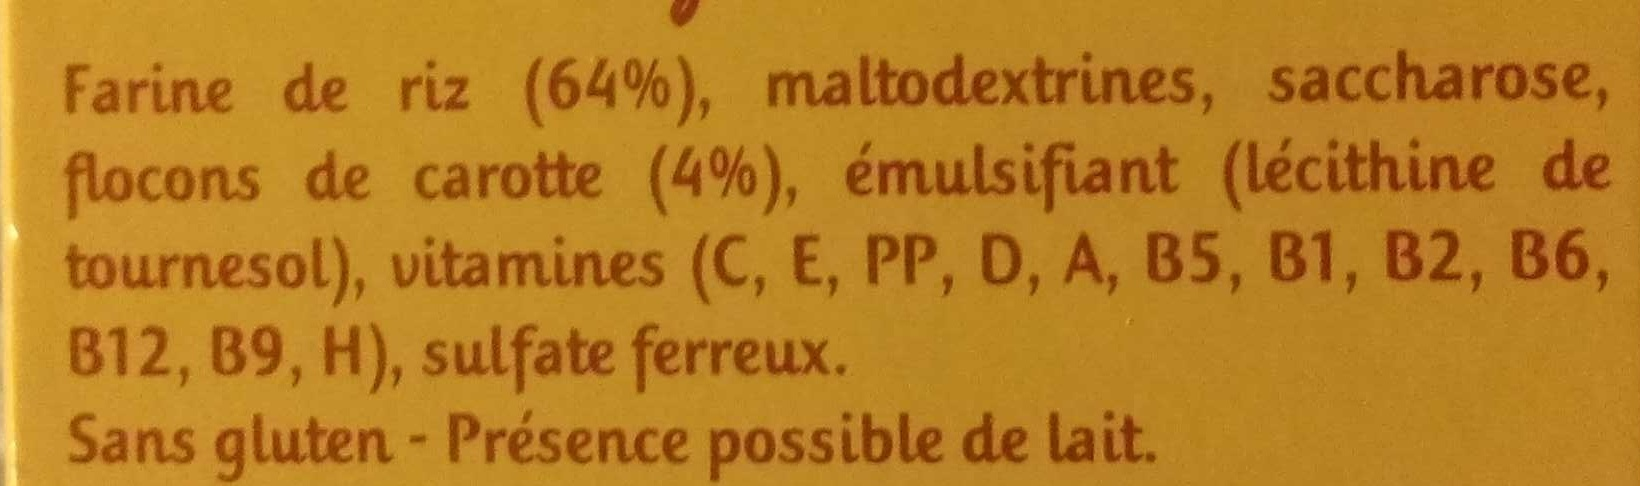 Mes 1ères Céréales Carottes - Ingredienti - fr